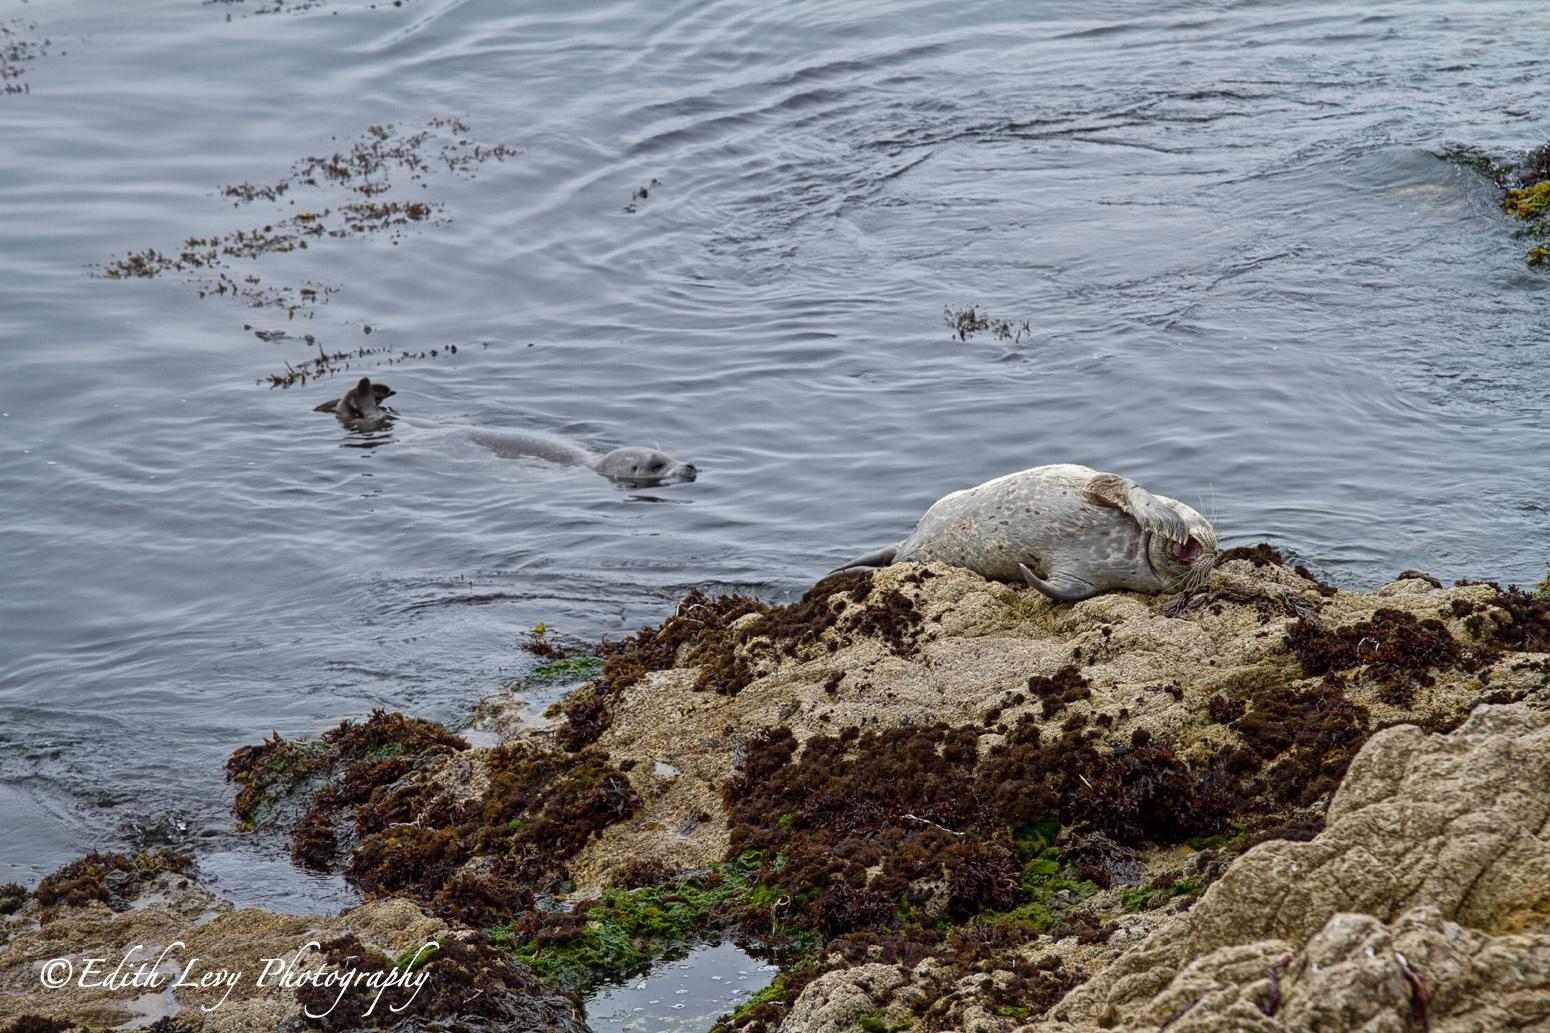 Point Lobos State Nature Reserve, California, sea lions, Pebble Beach, 17 Mile Drive, sea lion cove, harbour seal